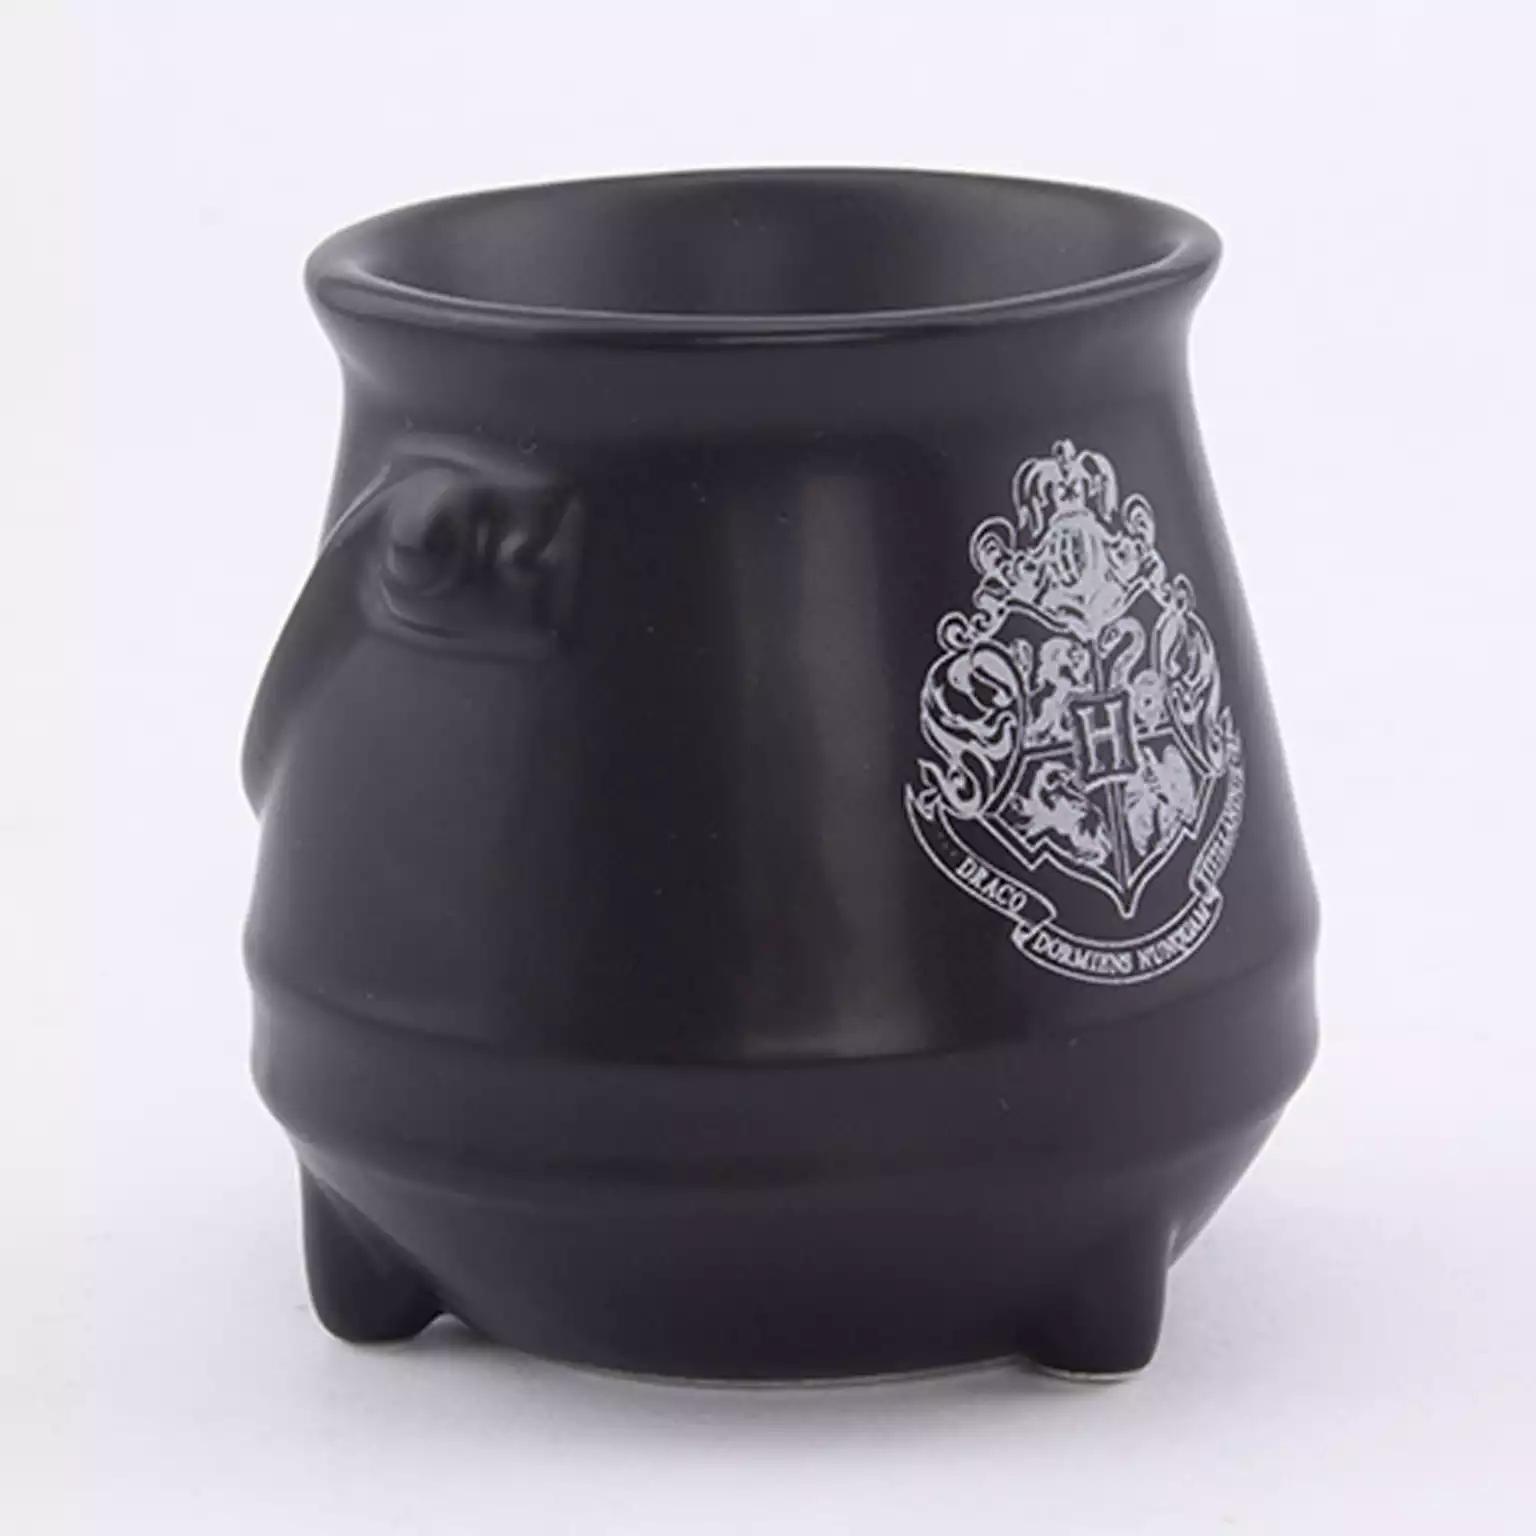 Harry Potter-Cauldron Egg Cup (Free C&C) - £1.80 @ Debenhams